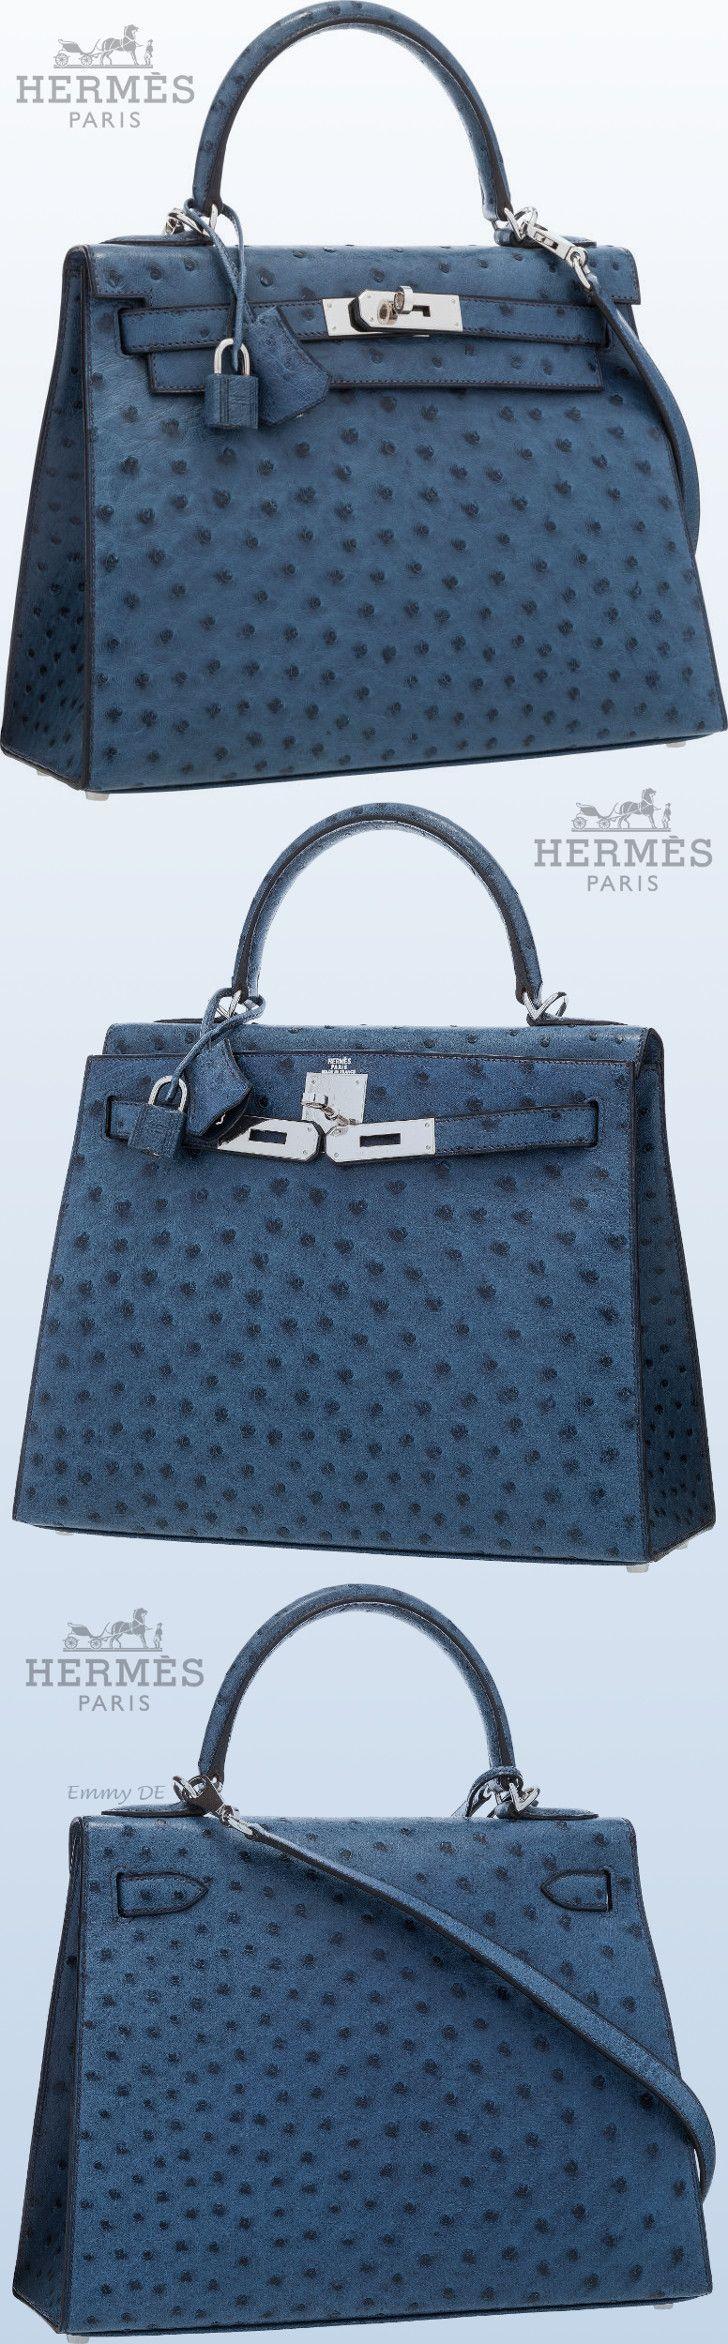 Emmy DE * Hermès Blue Roi Ostrich Sellier Kelly Bag  |  @  hermes bags